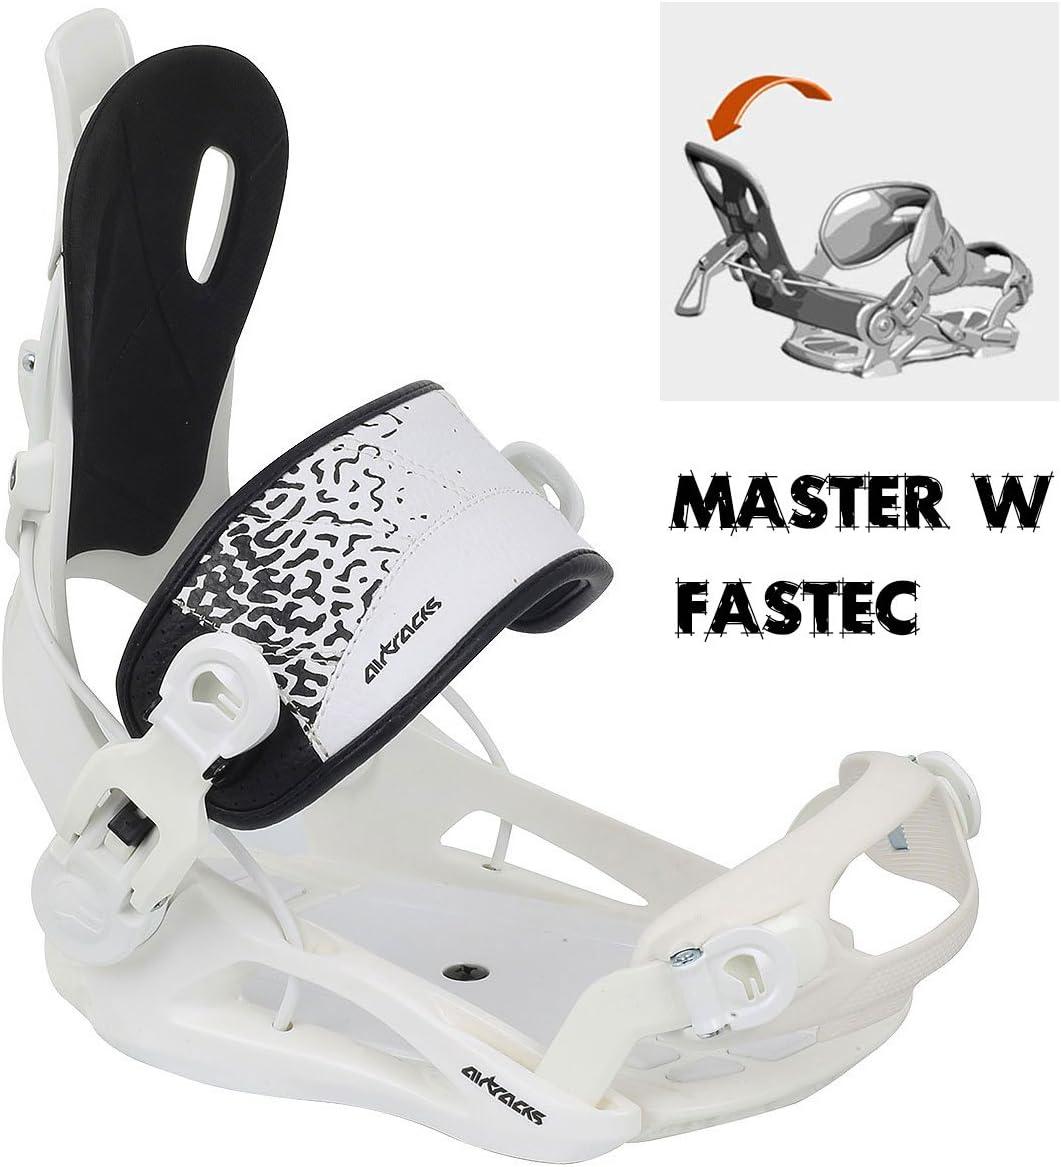 Paquete Completo Tabla Luminous Mujer Fijaciones Master W FASTEC+ Botas AIRTRACKS Snowboard Set SB Bolsa//Nuevo